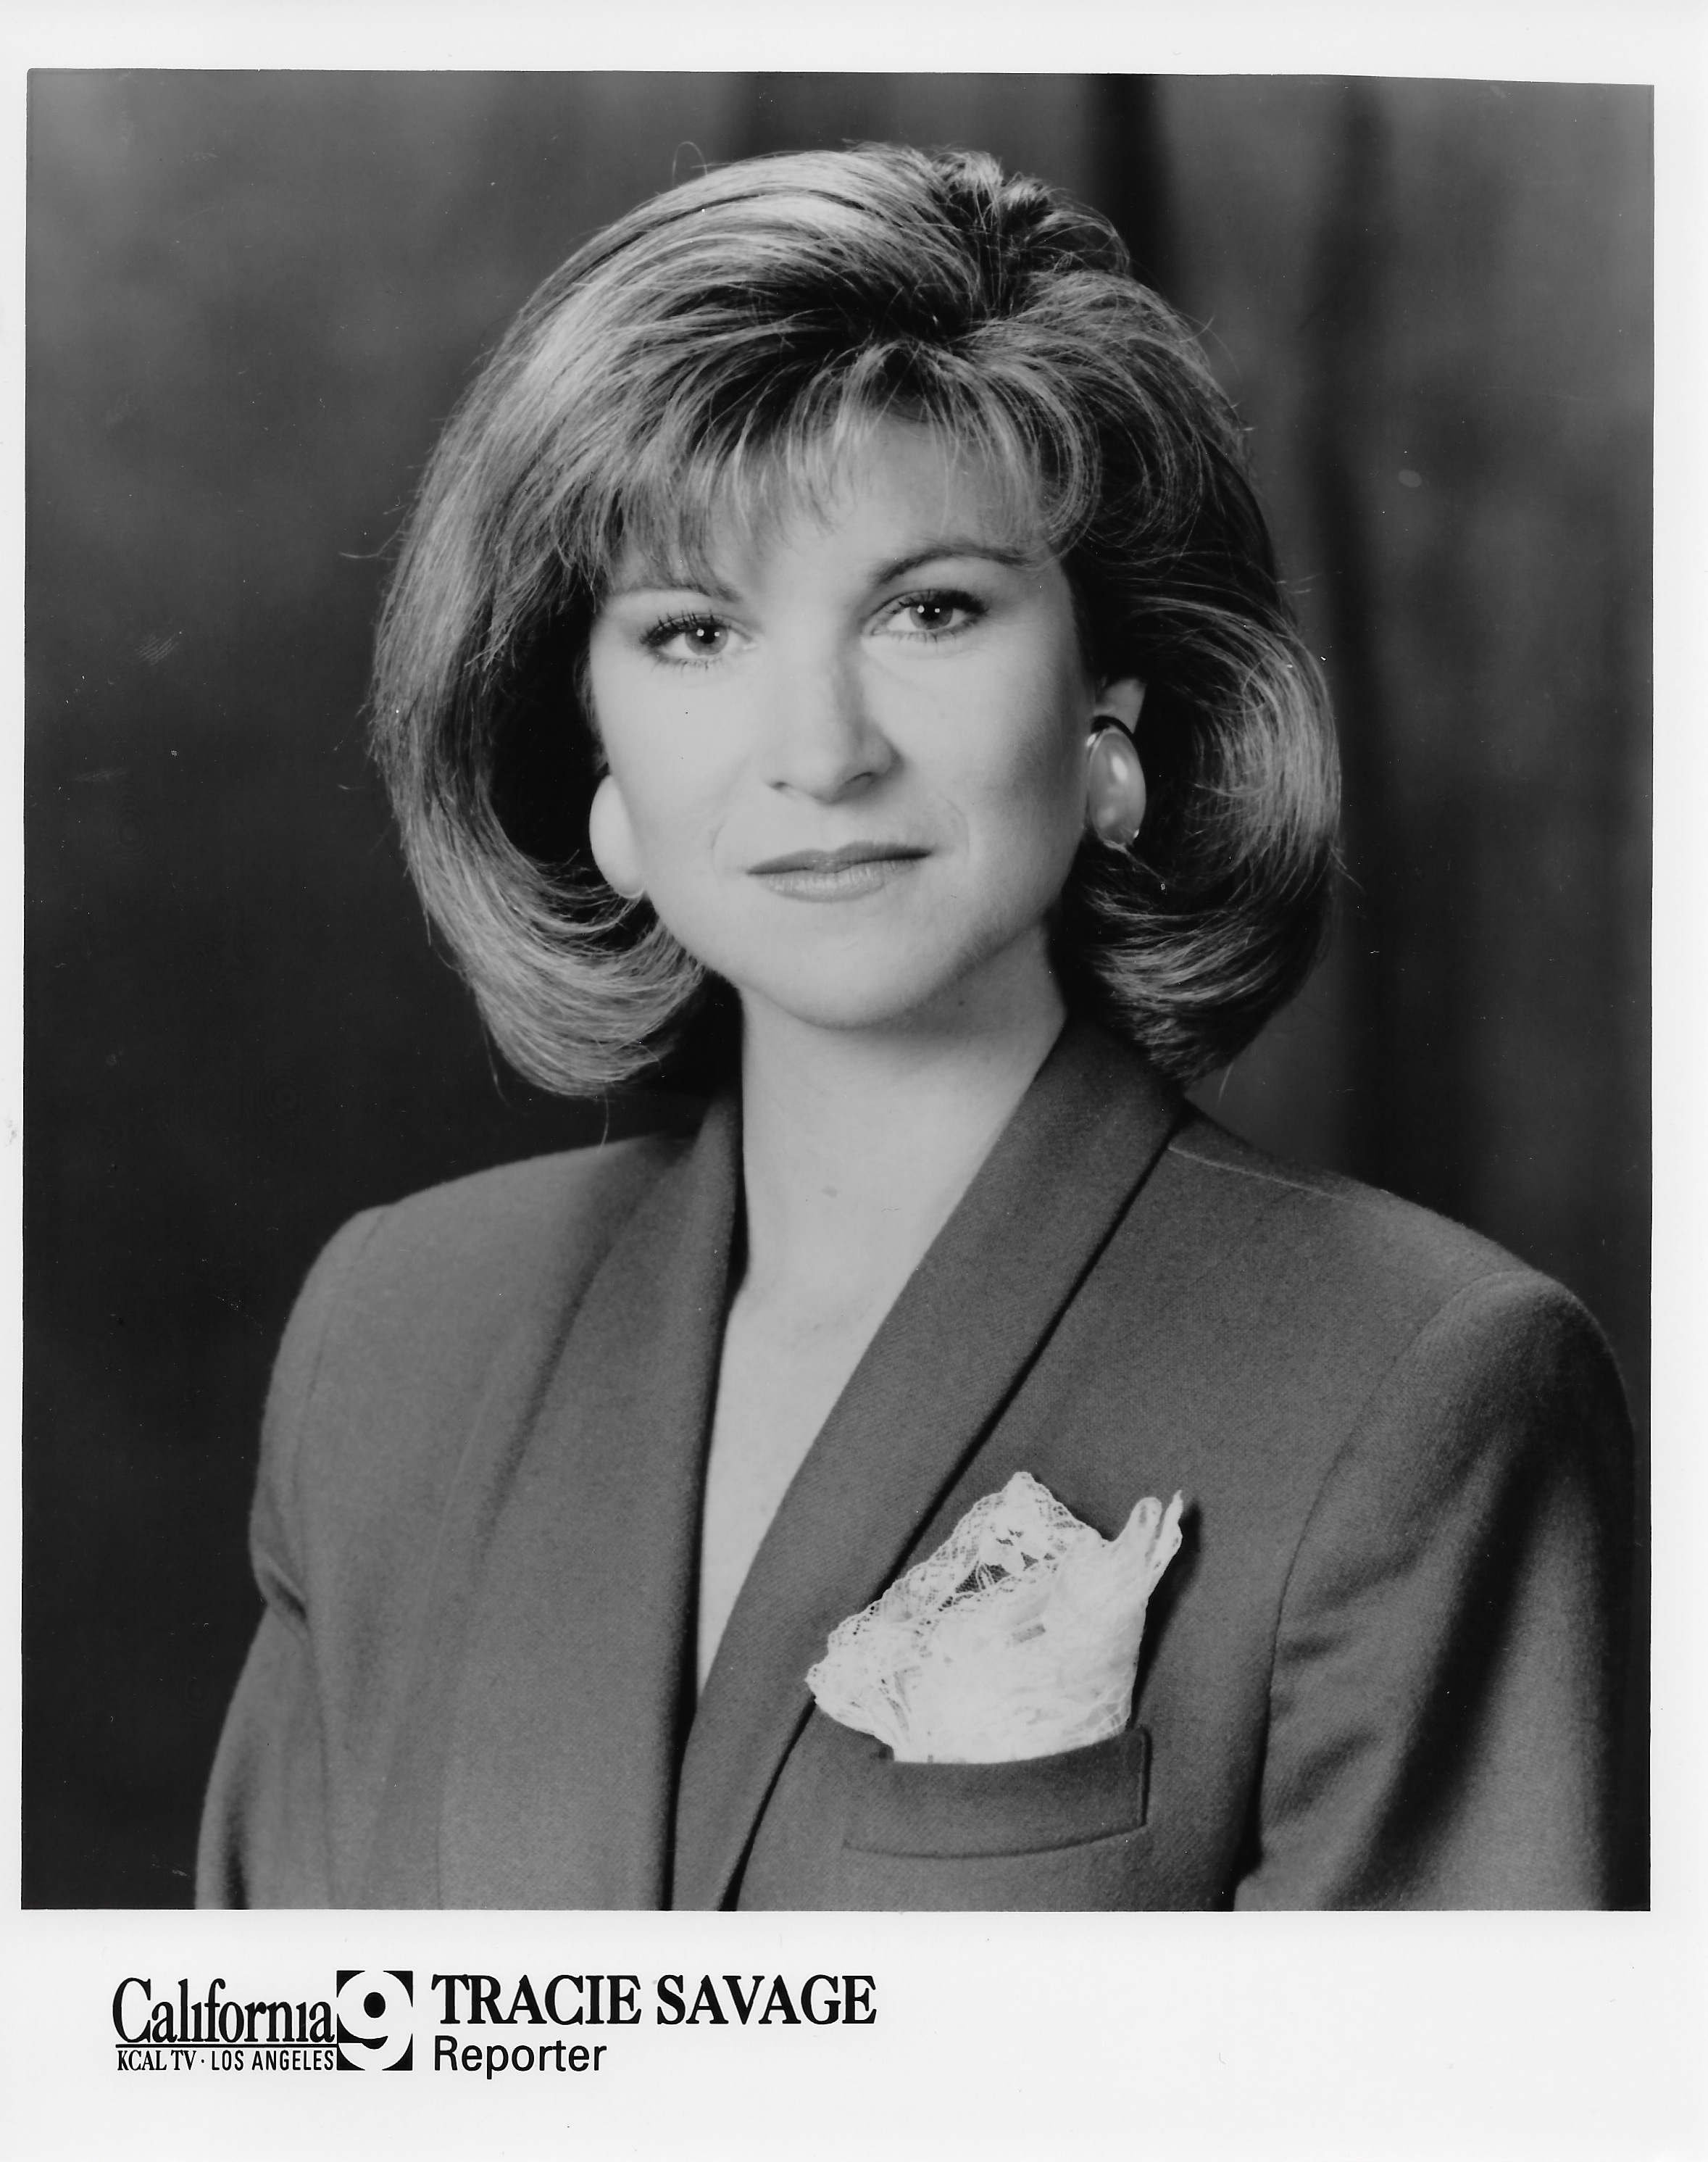 1991 - 1994 KCAL, Los Angeles